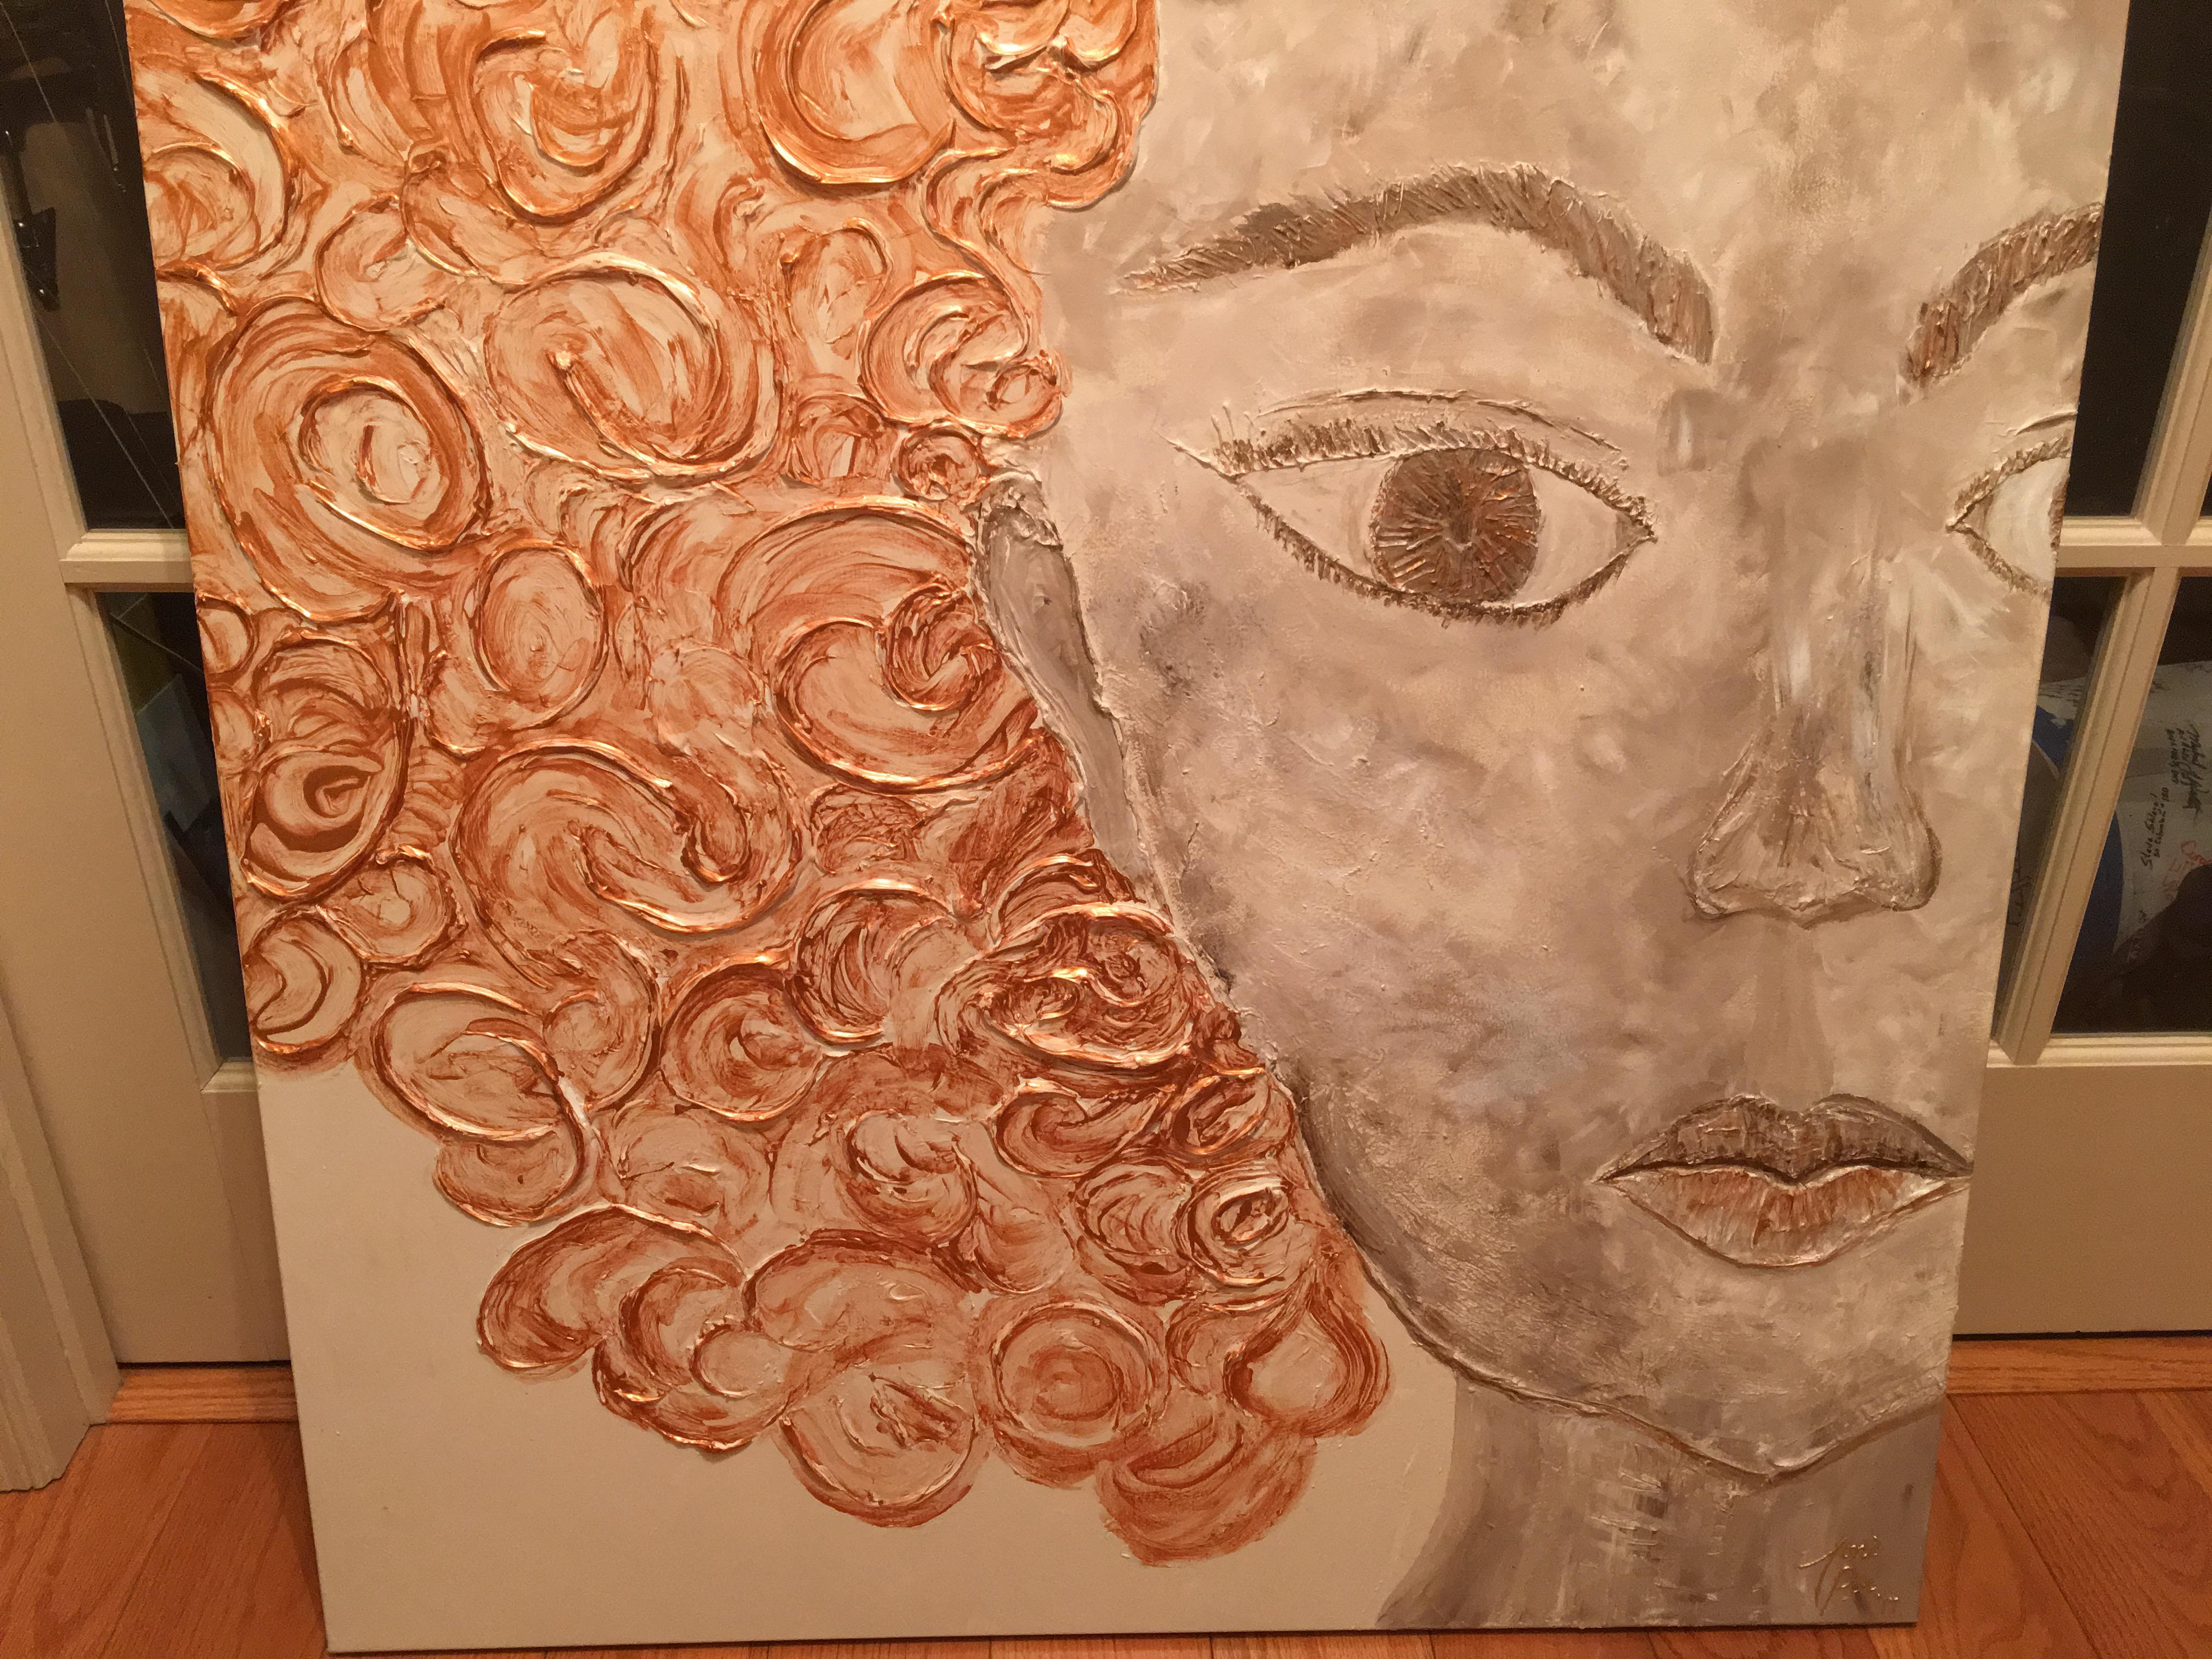 Vanessa art by Toni Poe